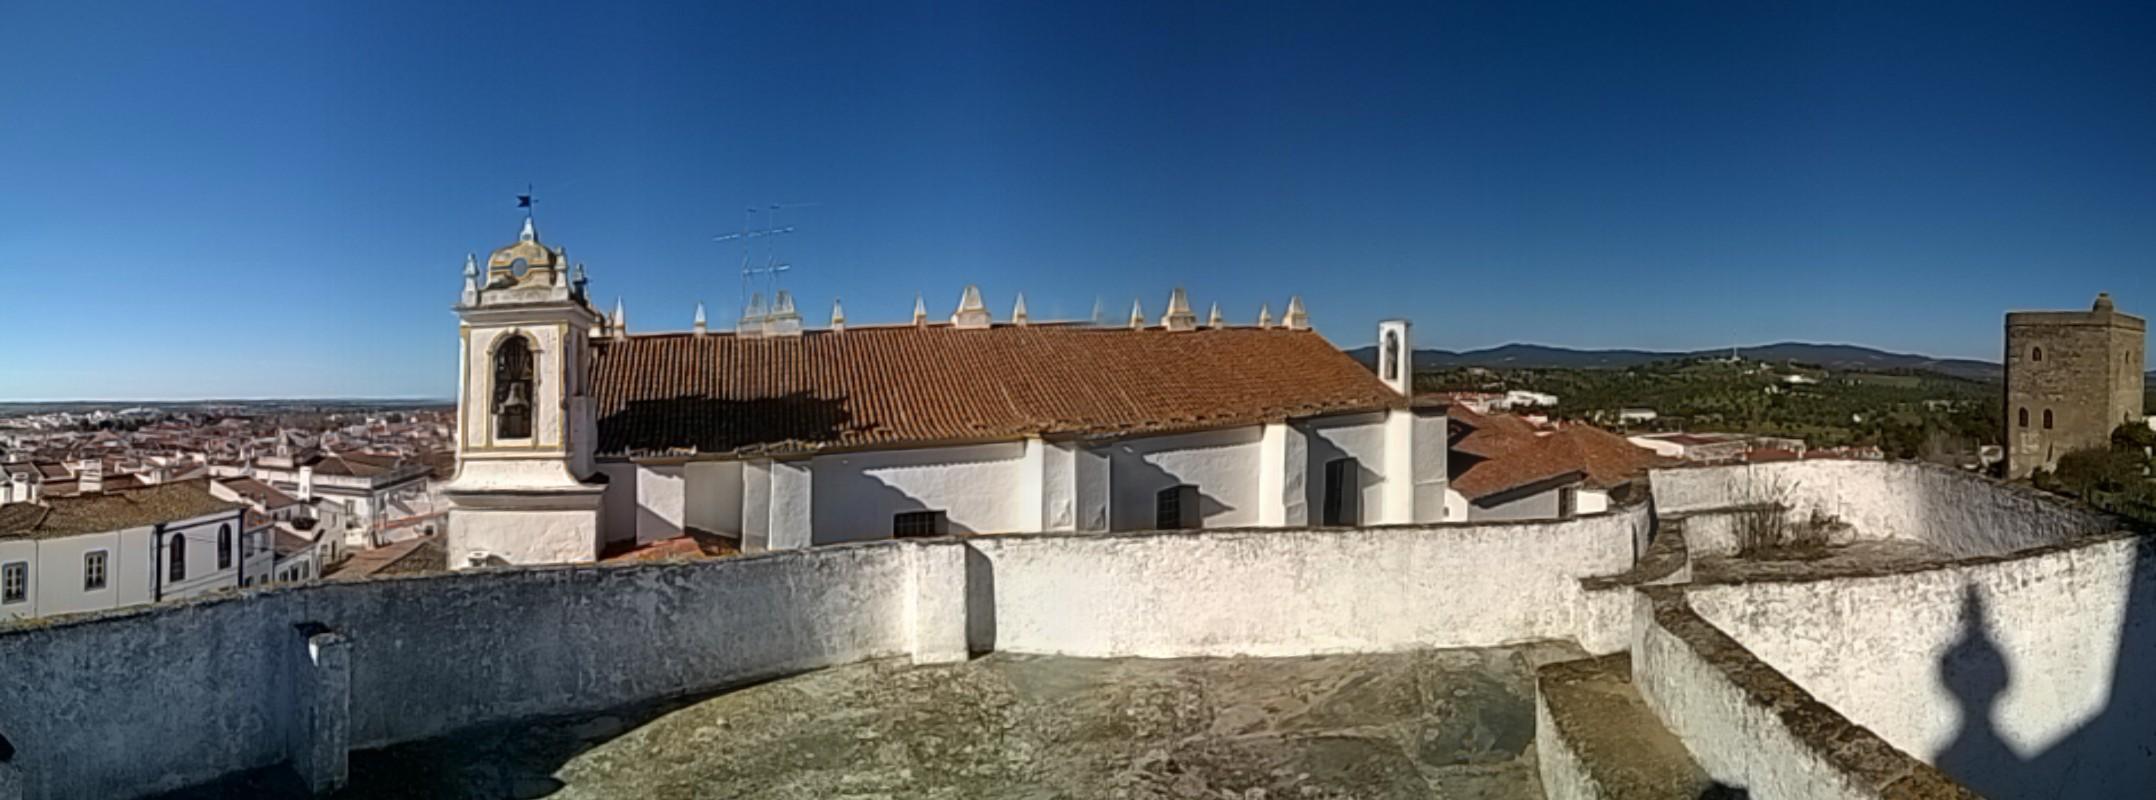 skyline_redondo_alentejo